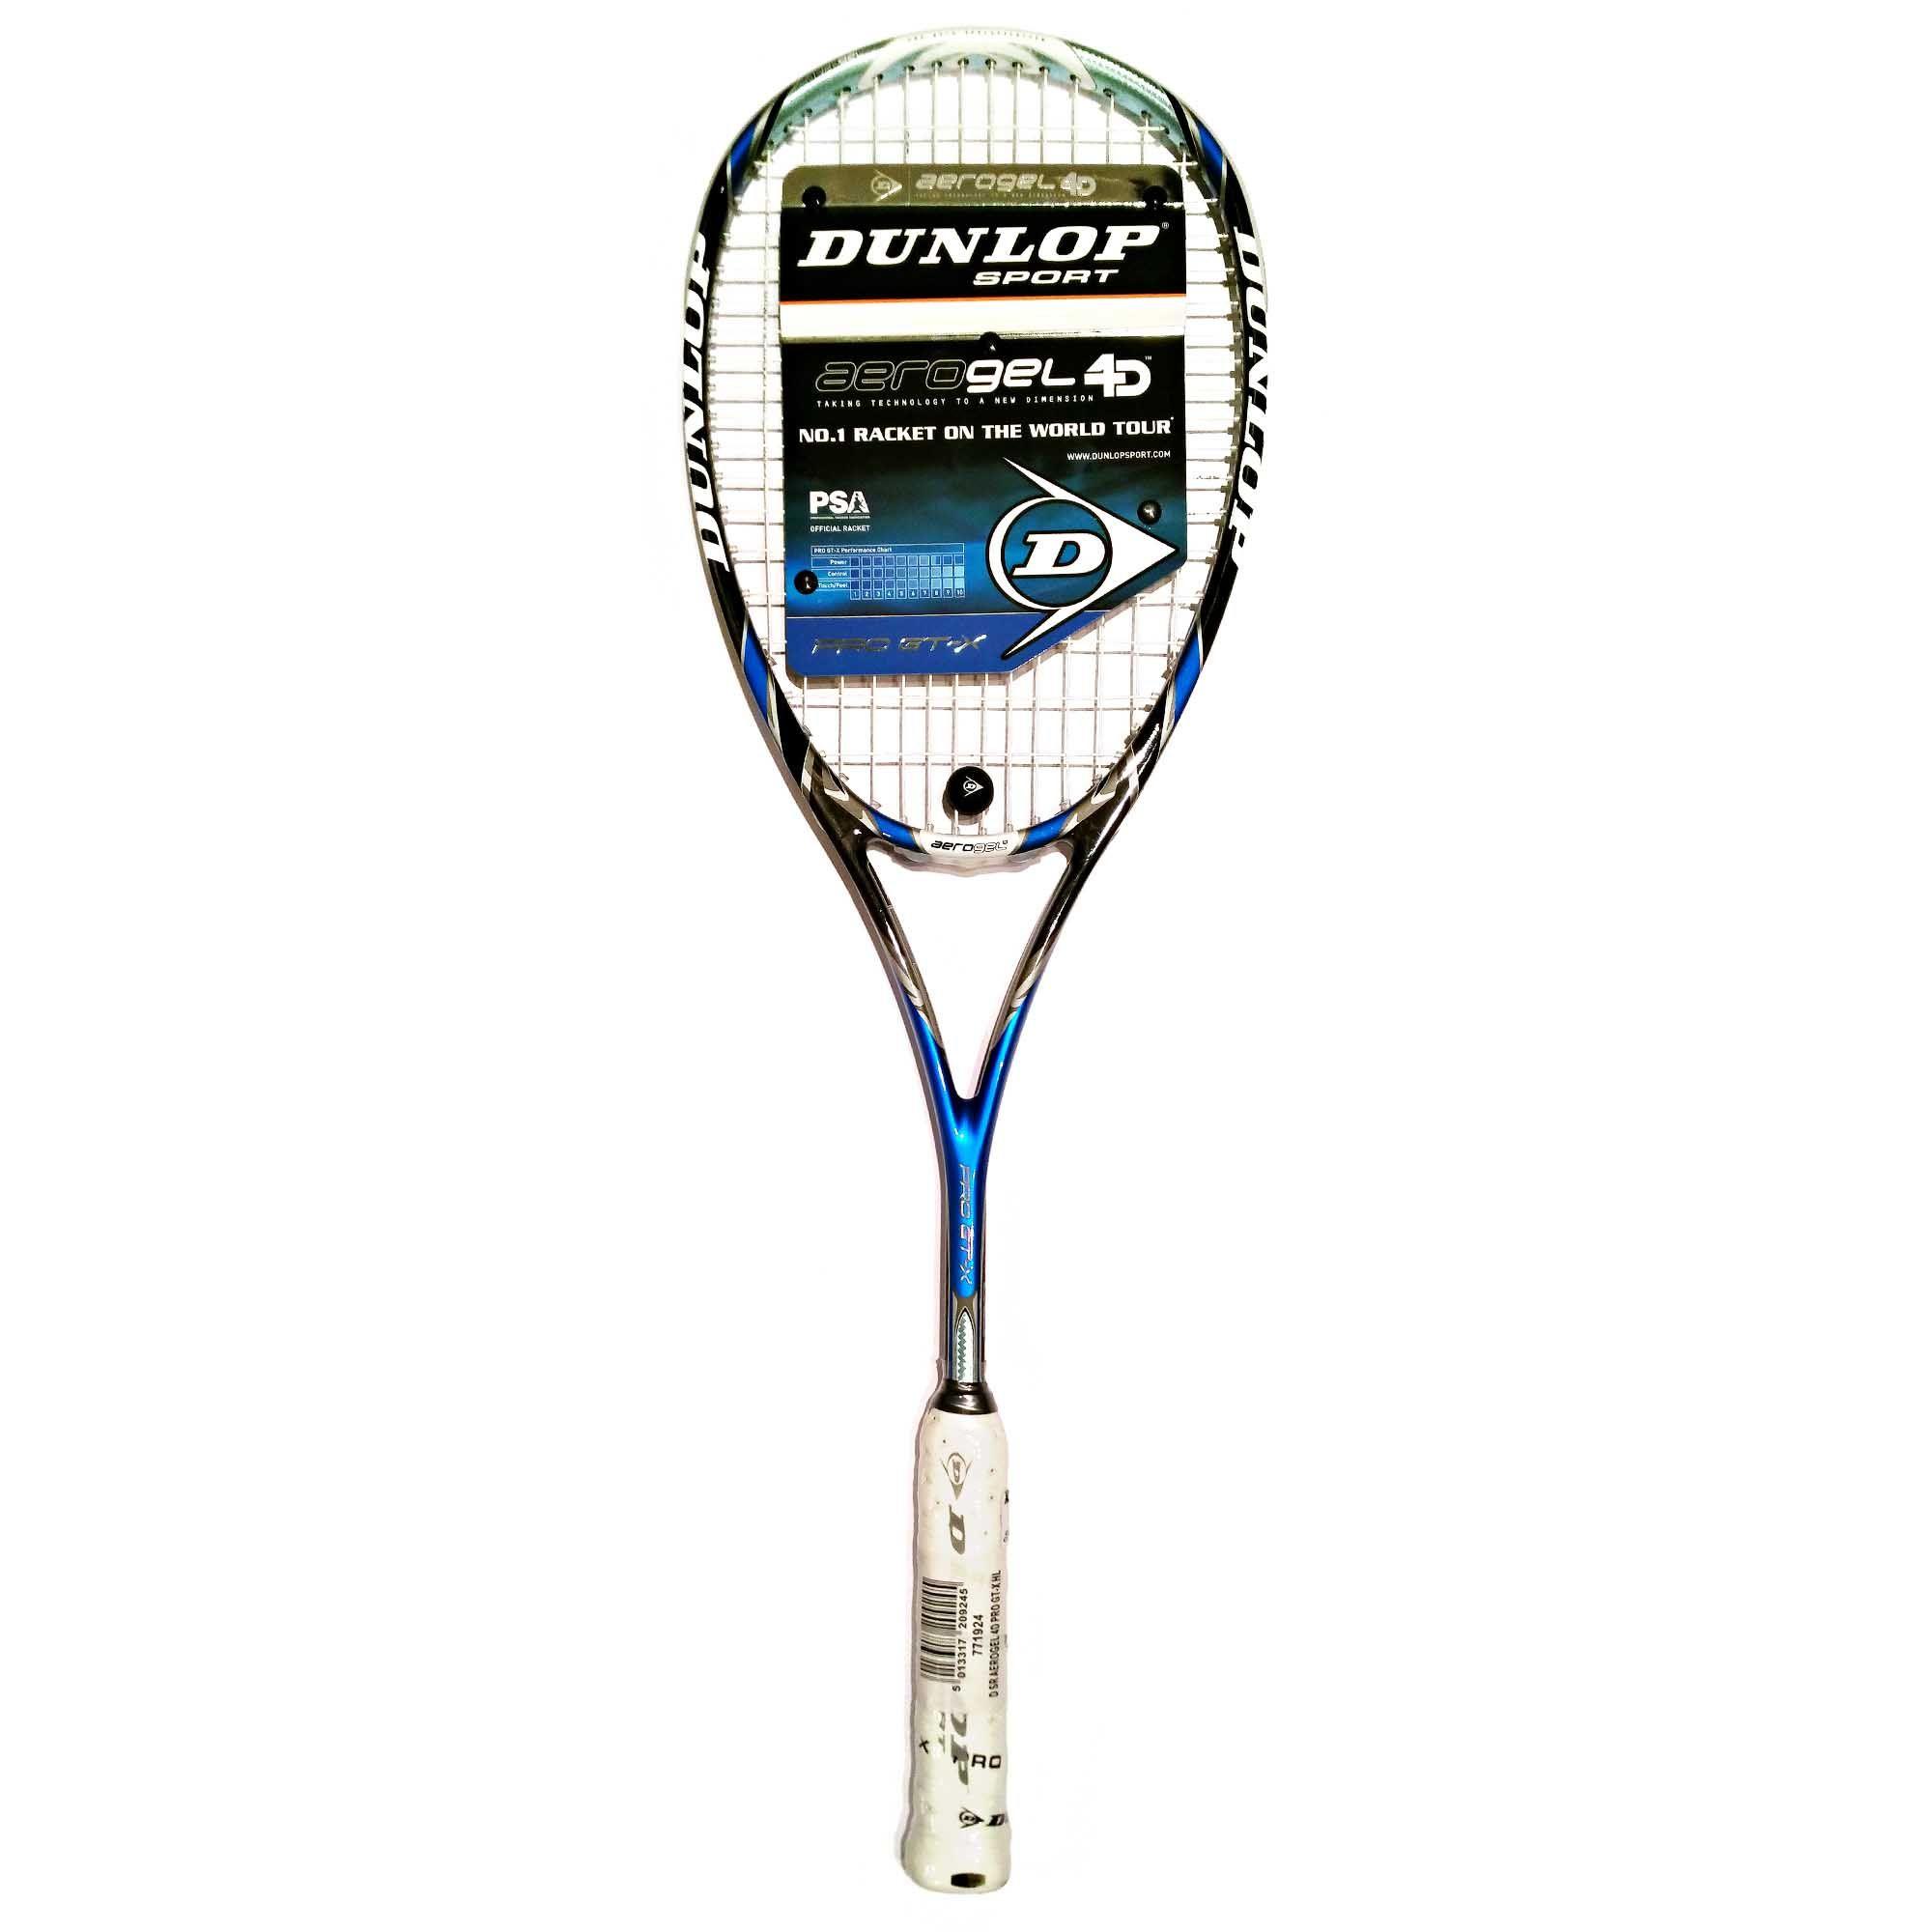 Dunlop Aerogel 4d Pro Gt X Squash Racket